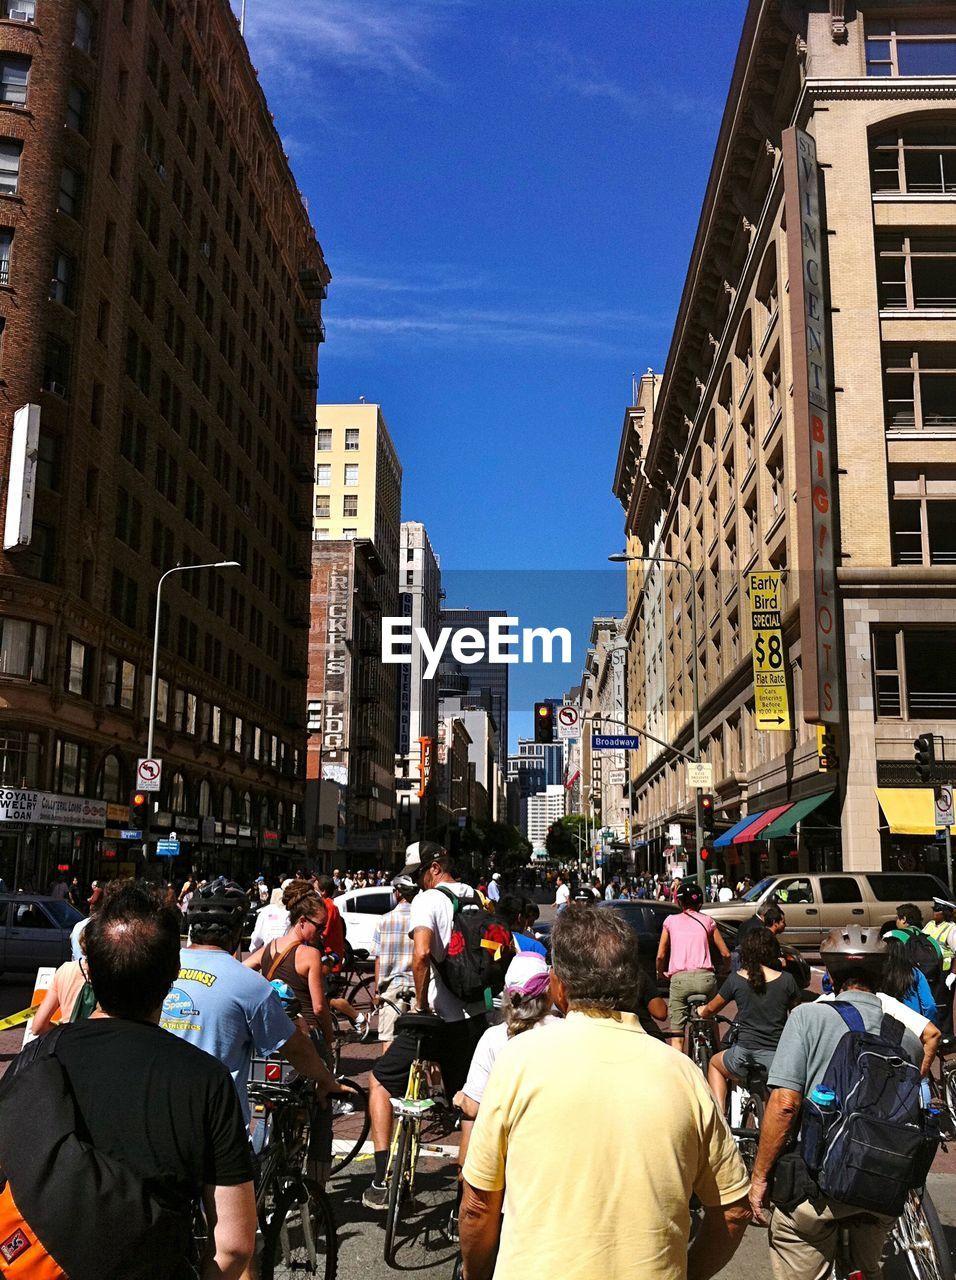 People On Street Amidst Buildings Against Blue Sky In City